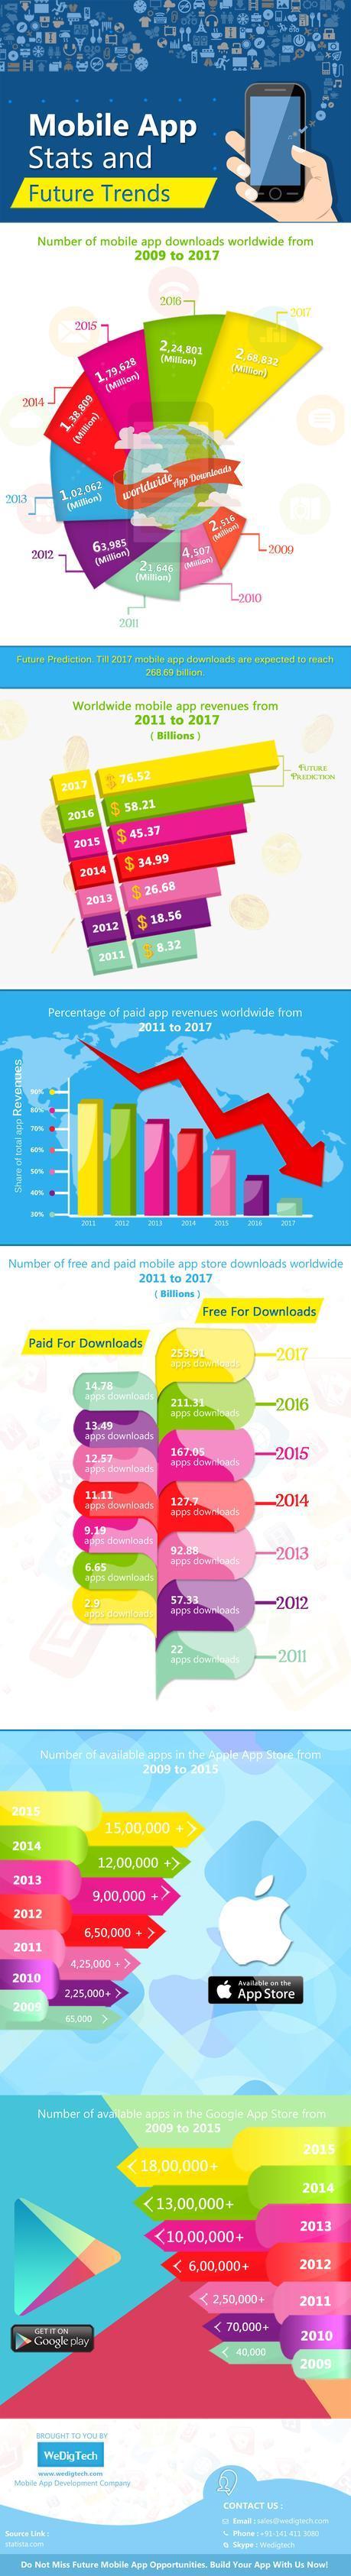 Mobile App Trends 2016